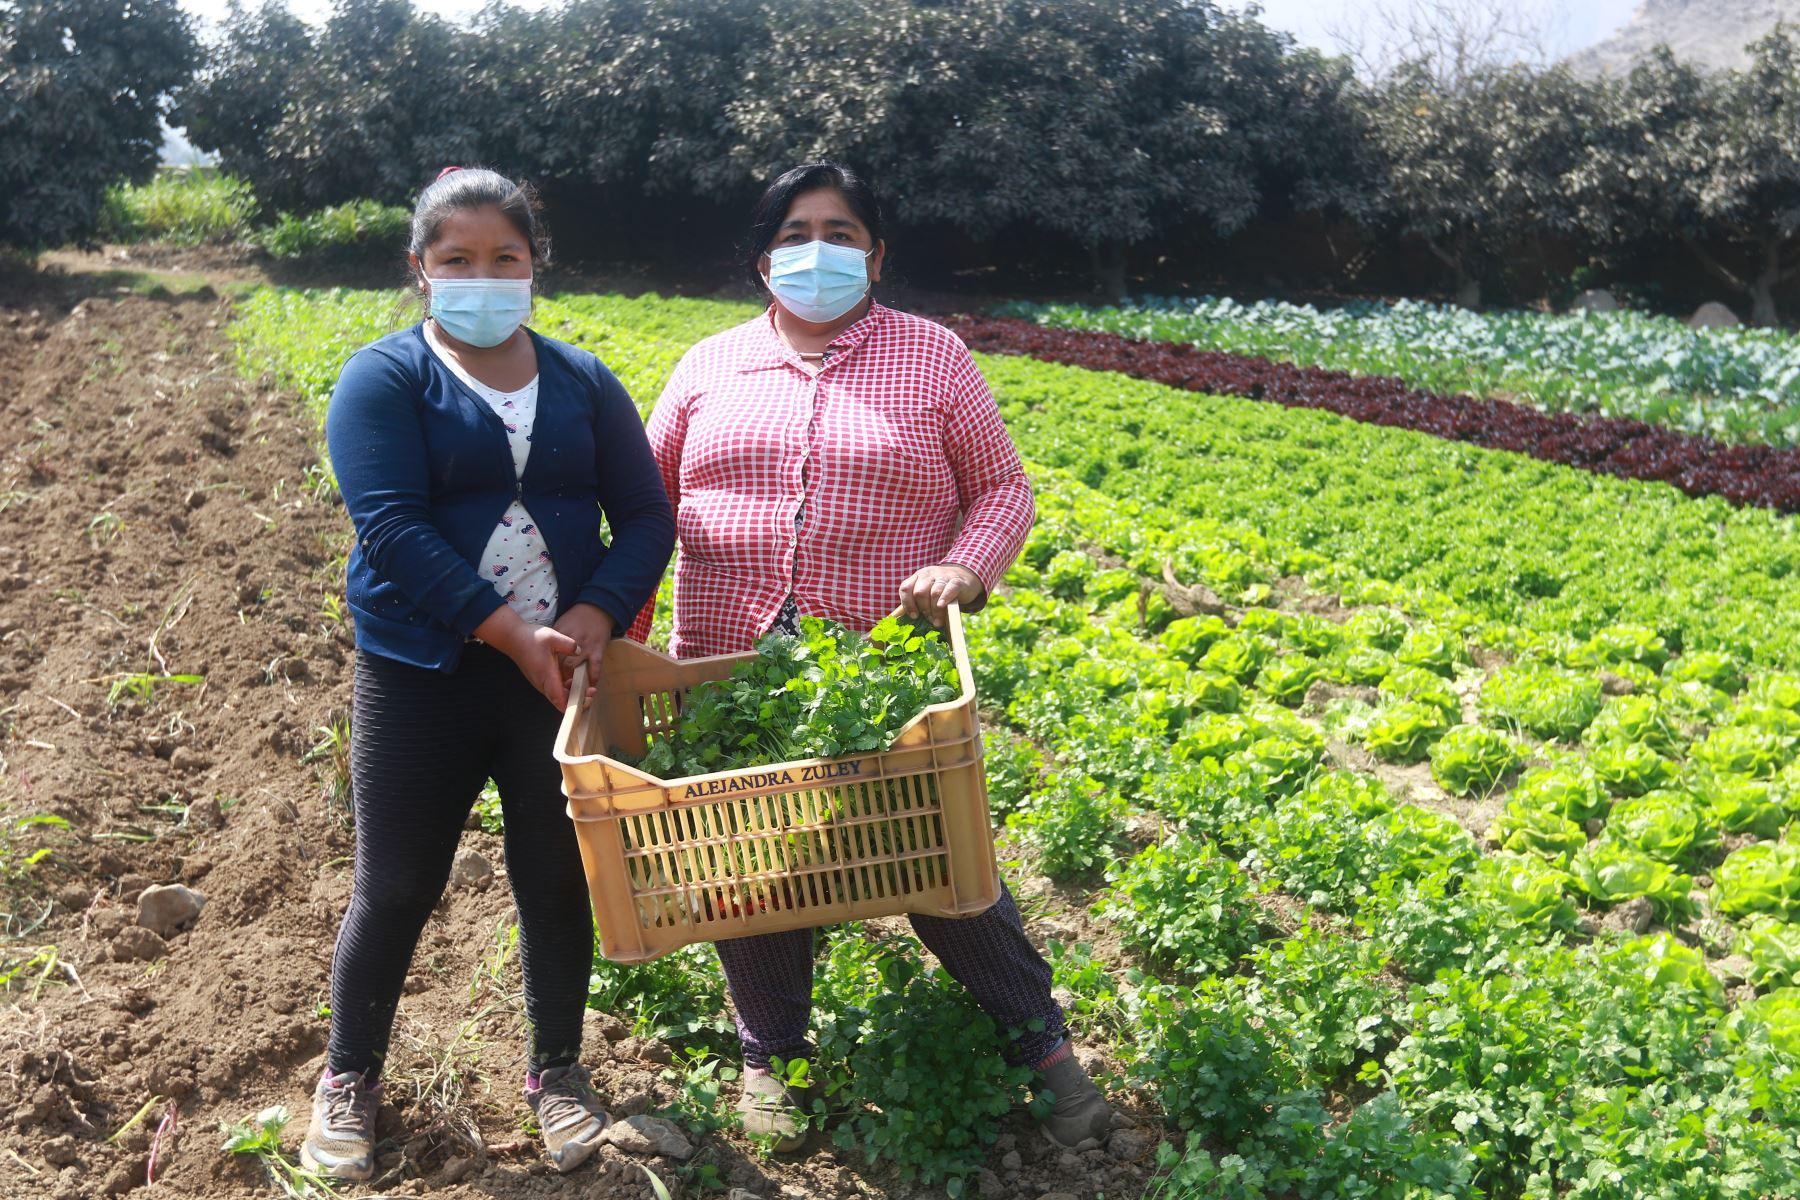 Agricultores. ANDINA/Jhonel Rodríguez Robles